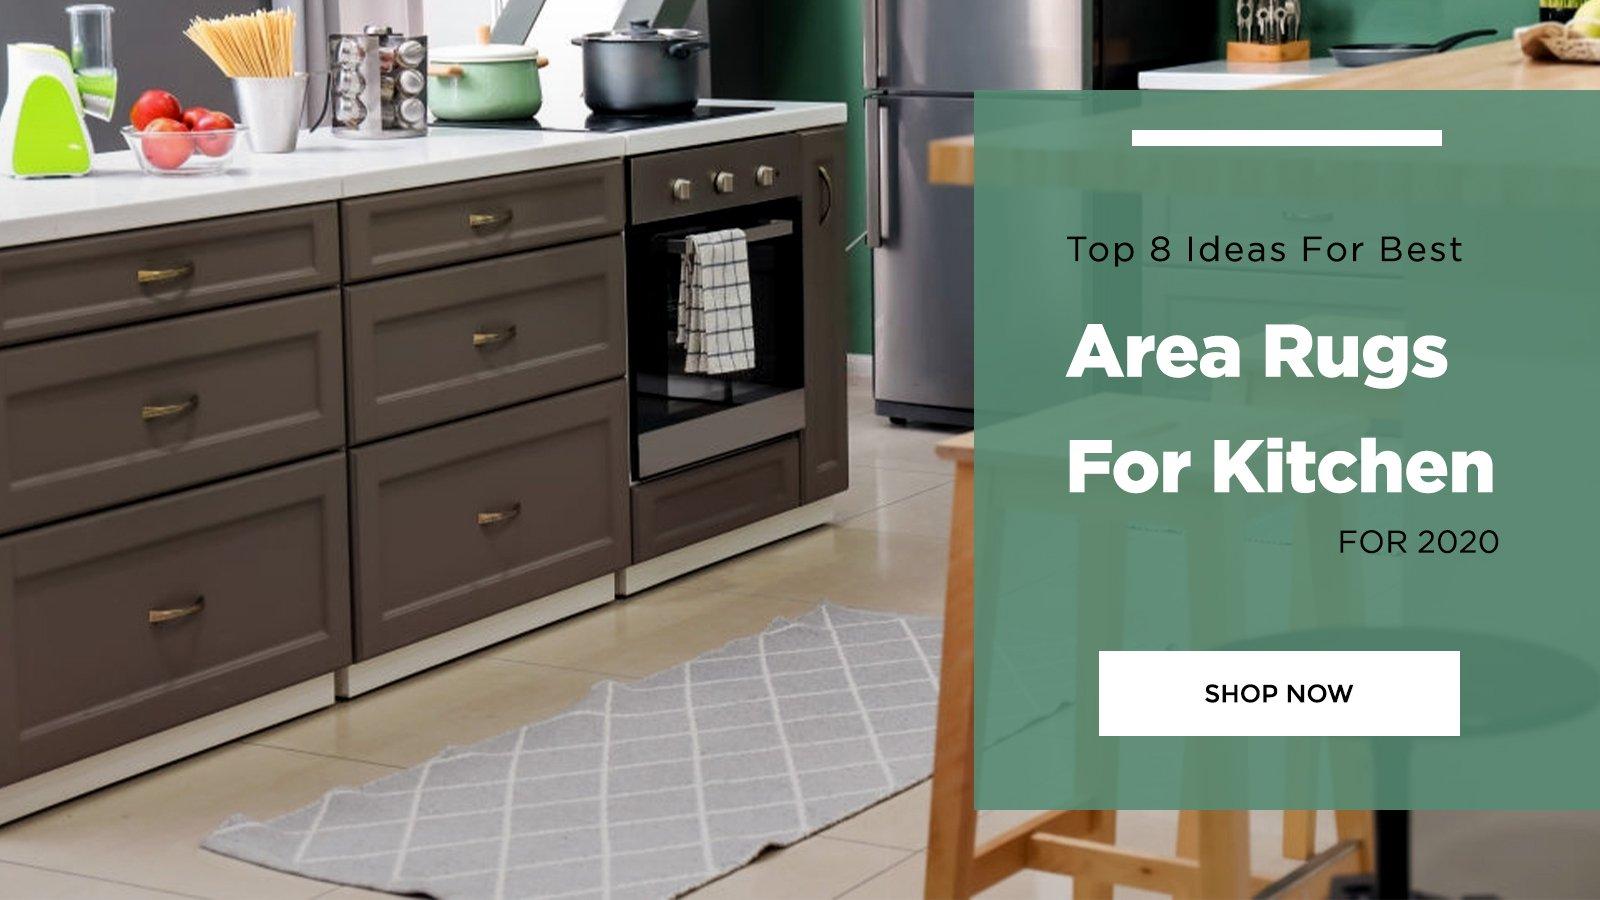 Benefits of modern kitchen rugs